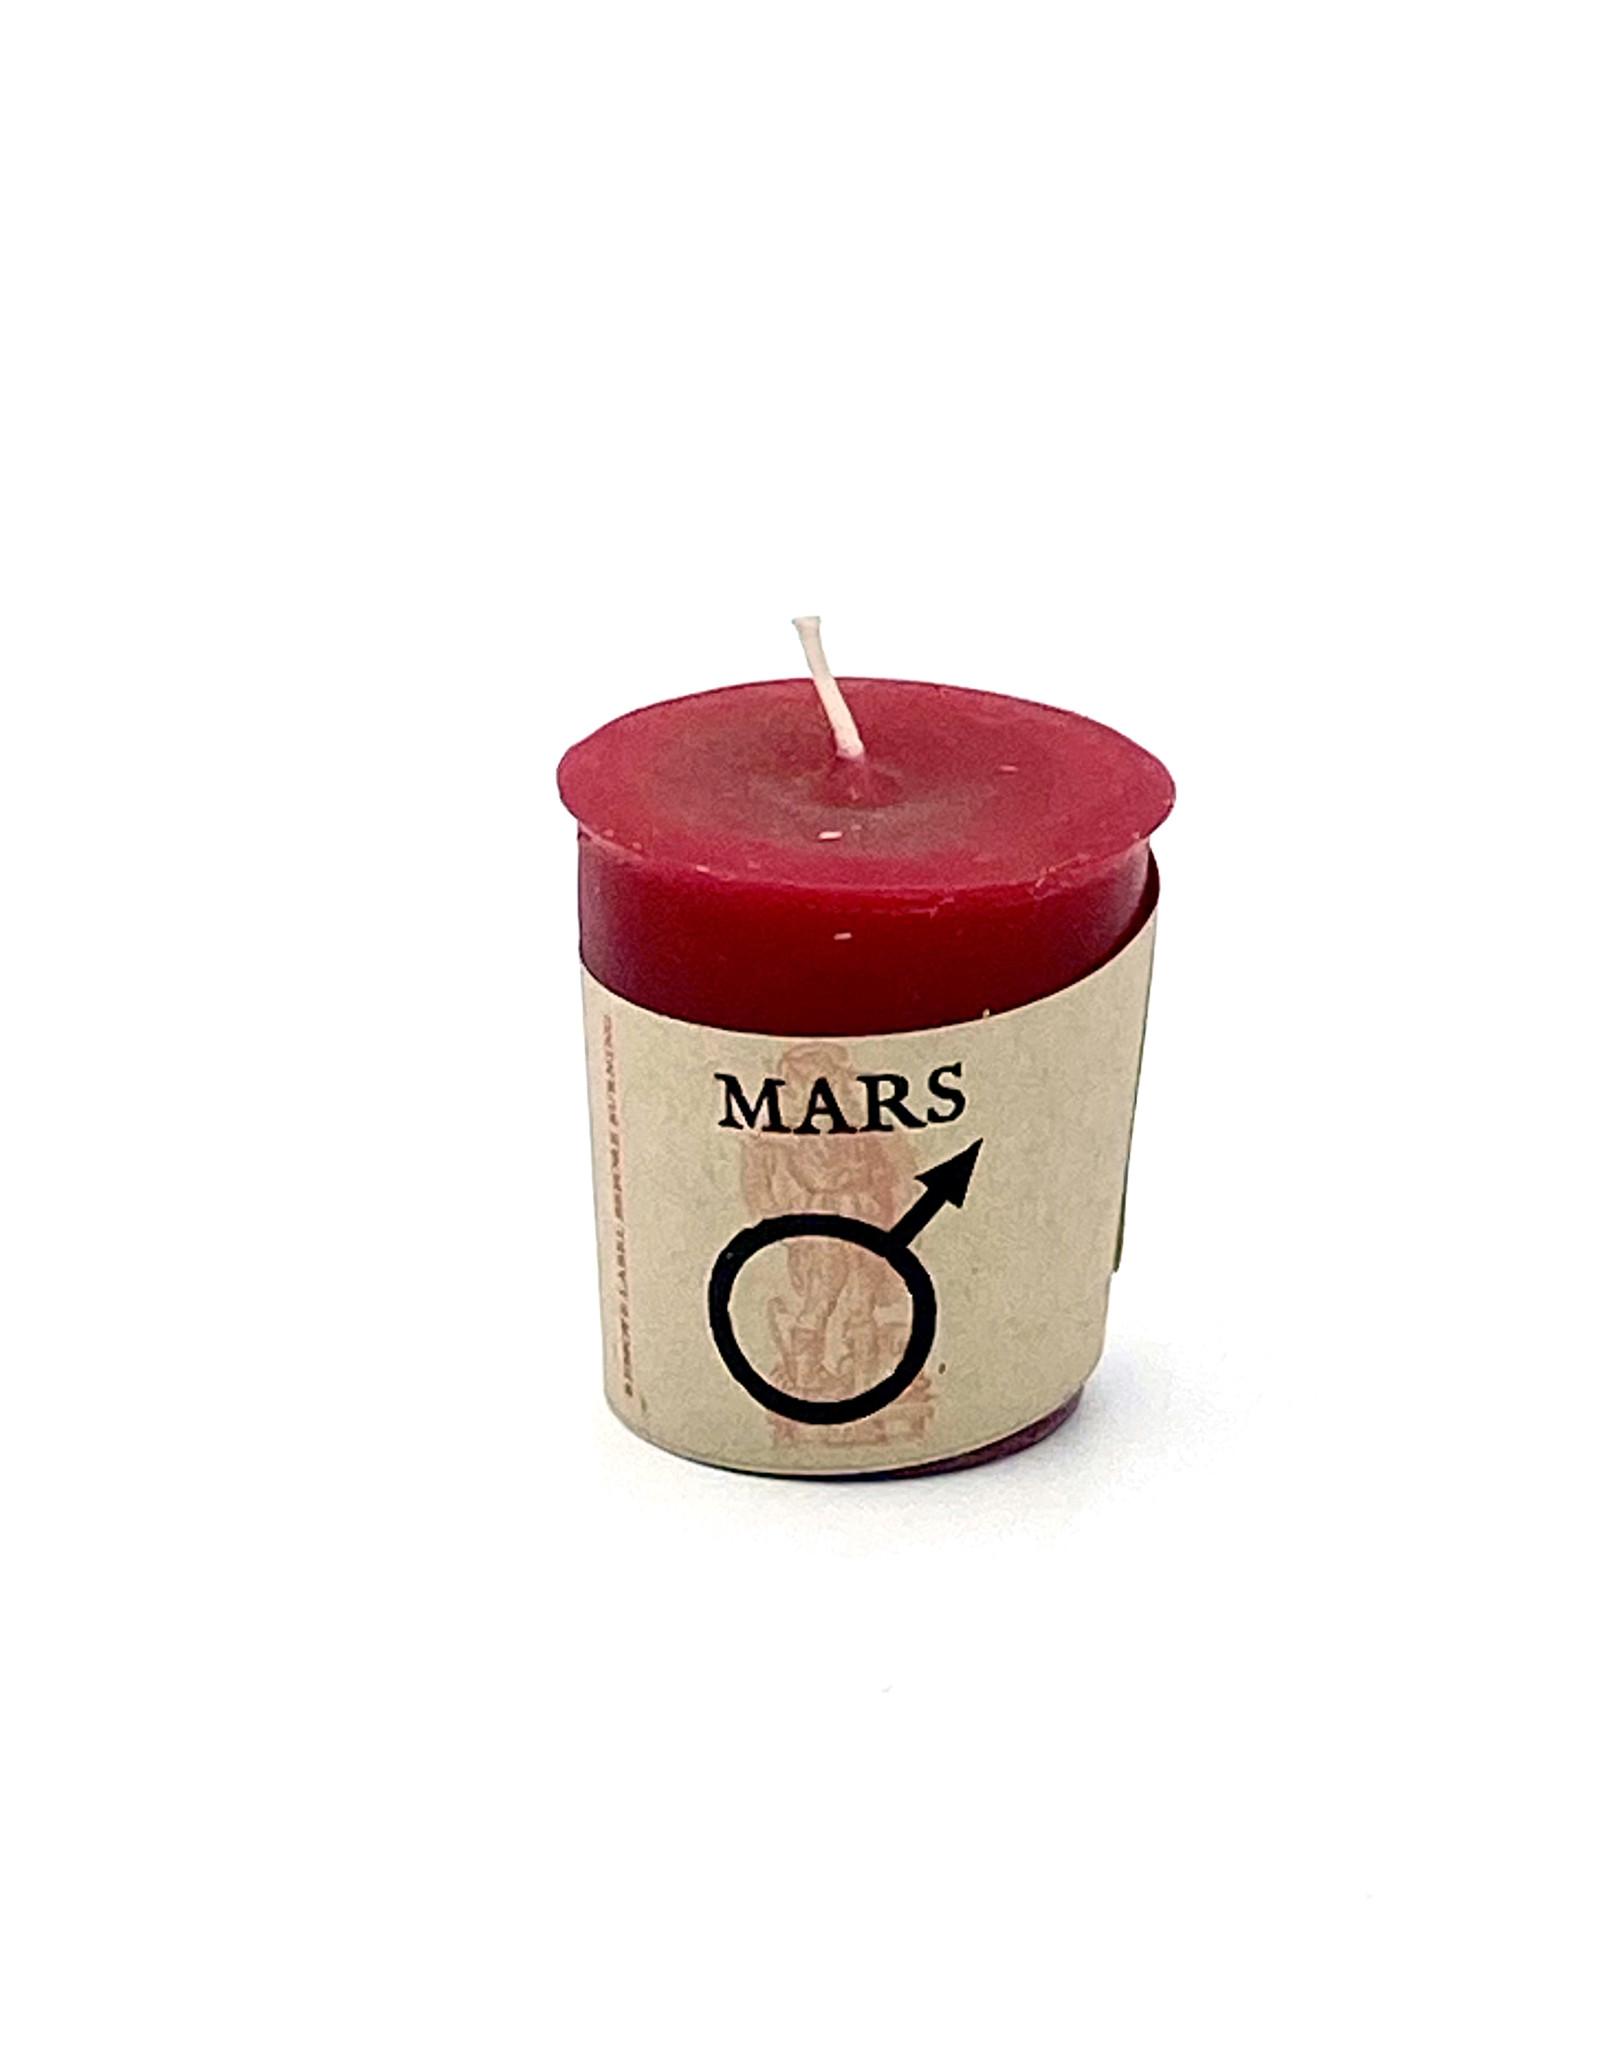 Mars Votive Candle